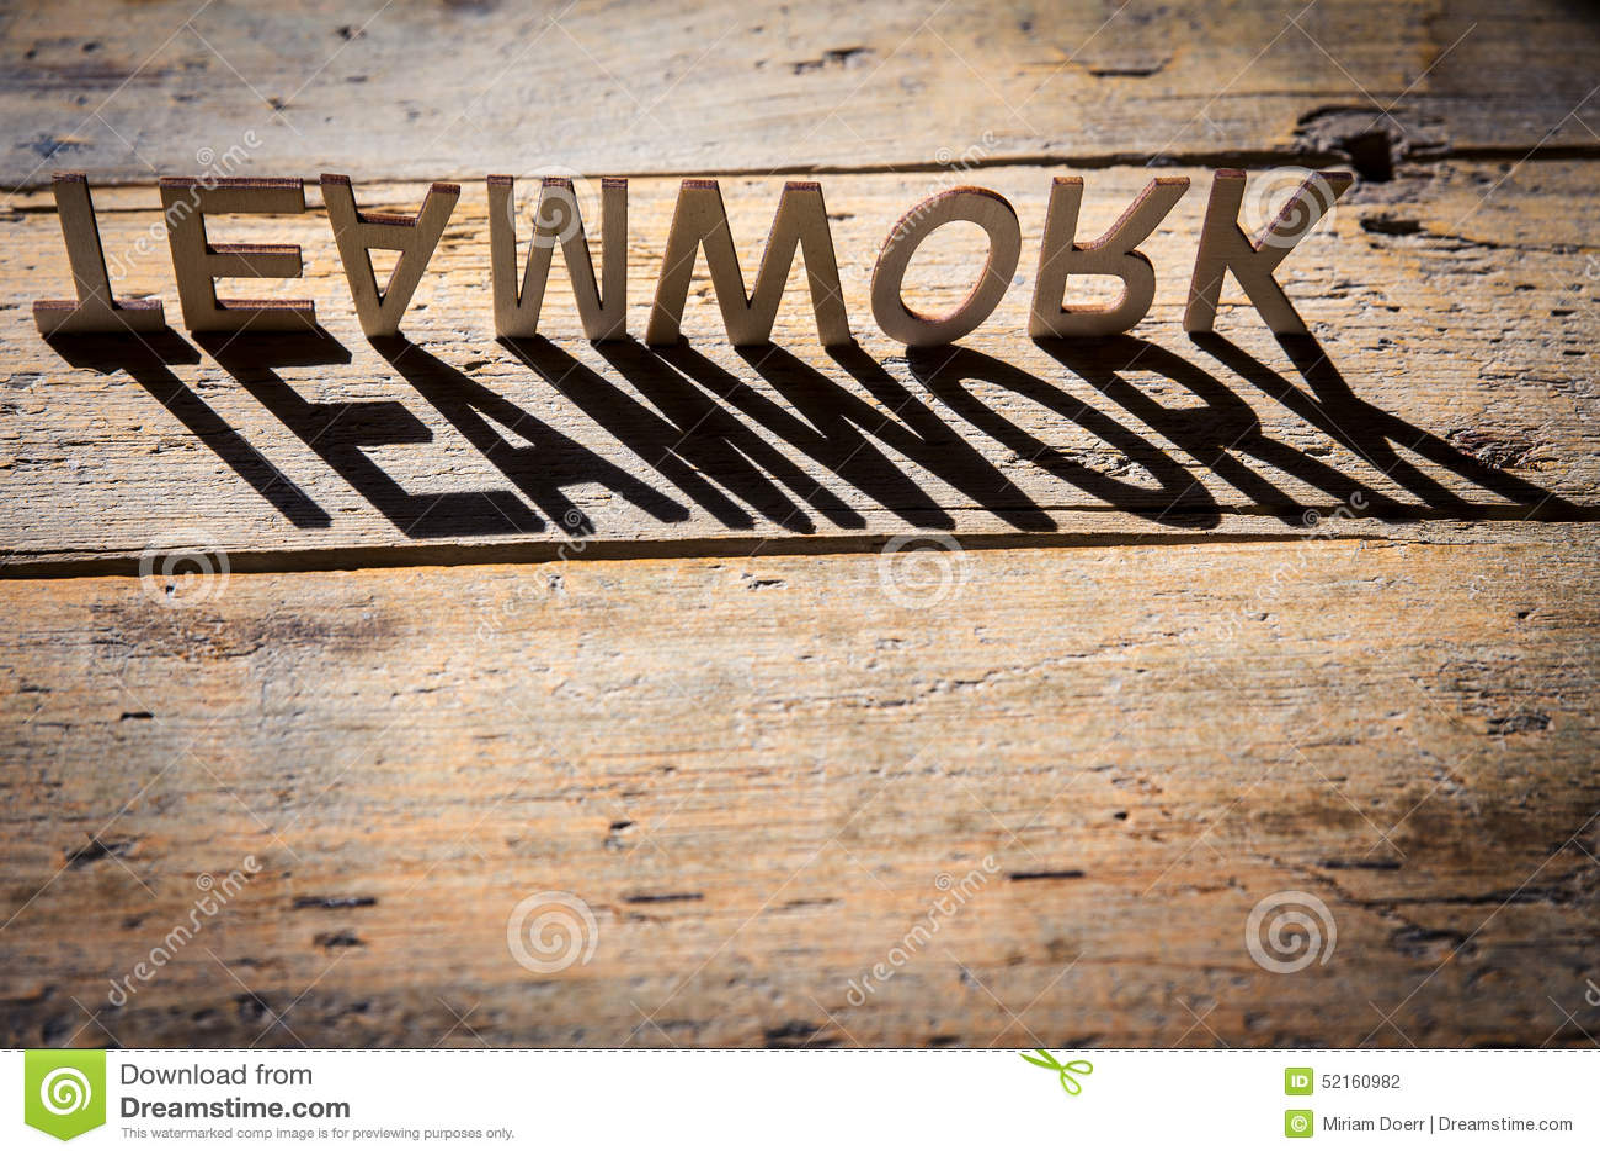 wooden letters build the word teamwork stock photo image 52160982. Black Bedroom Furniture Sets. Home Design Ideas